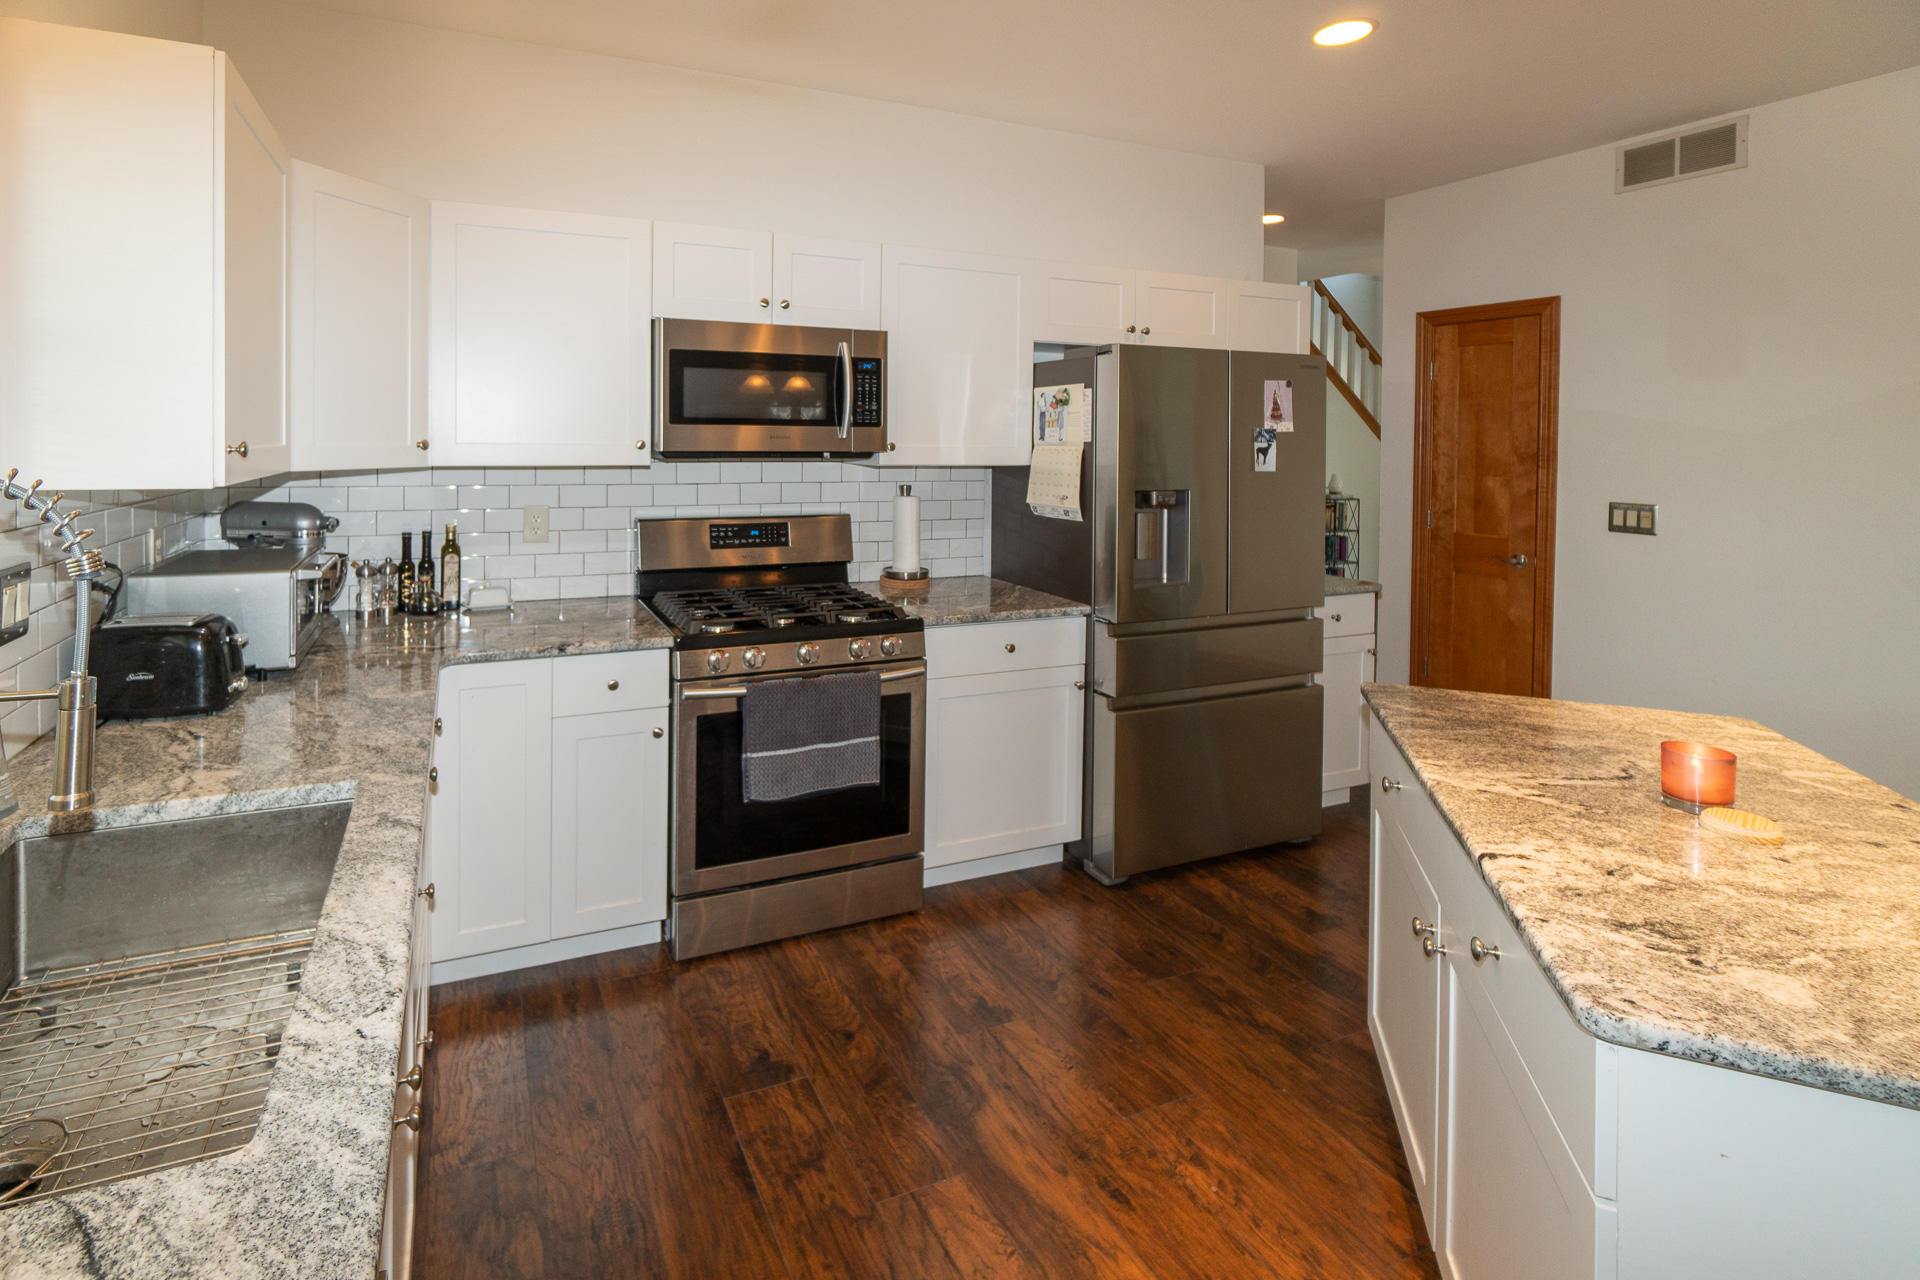 Kitchen + Stainless Appliances